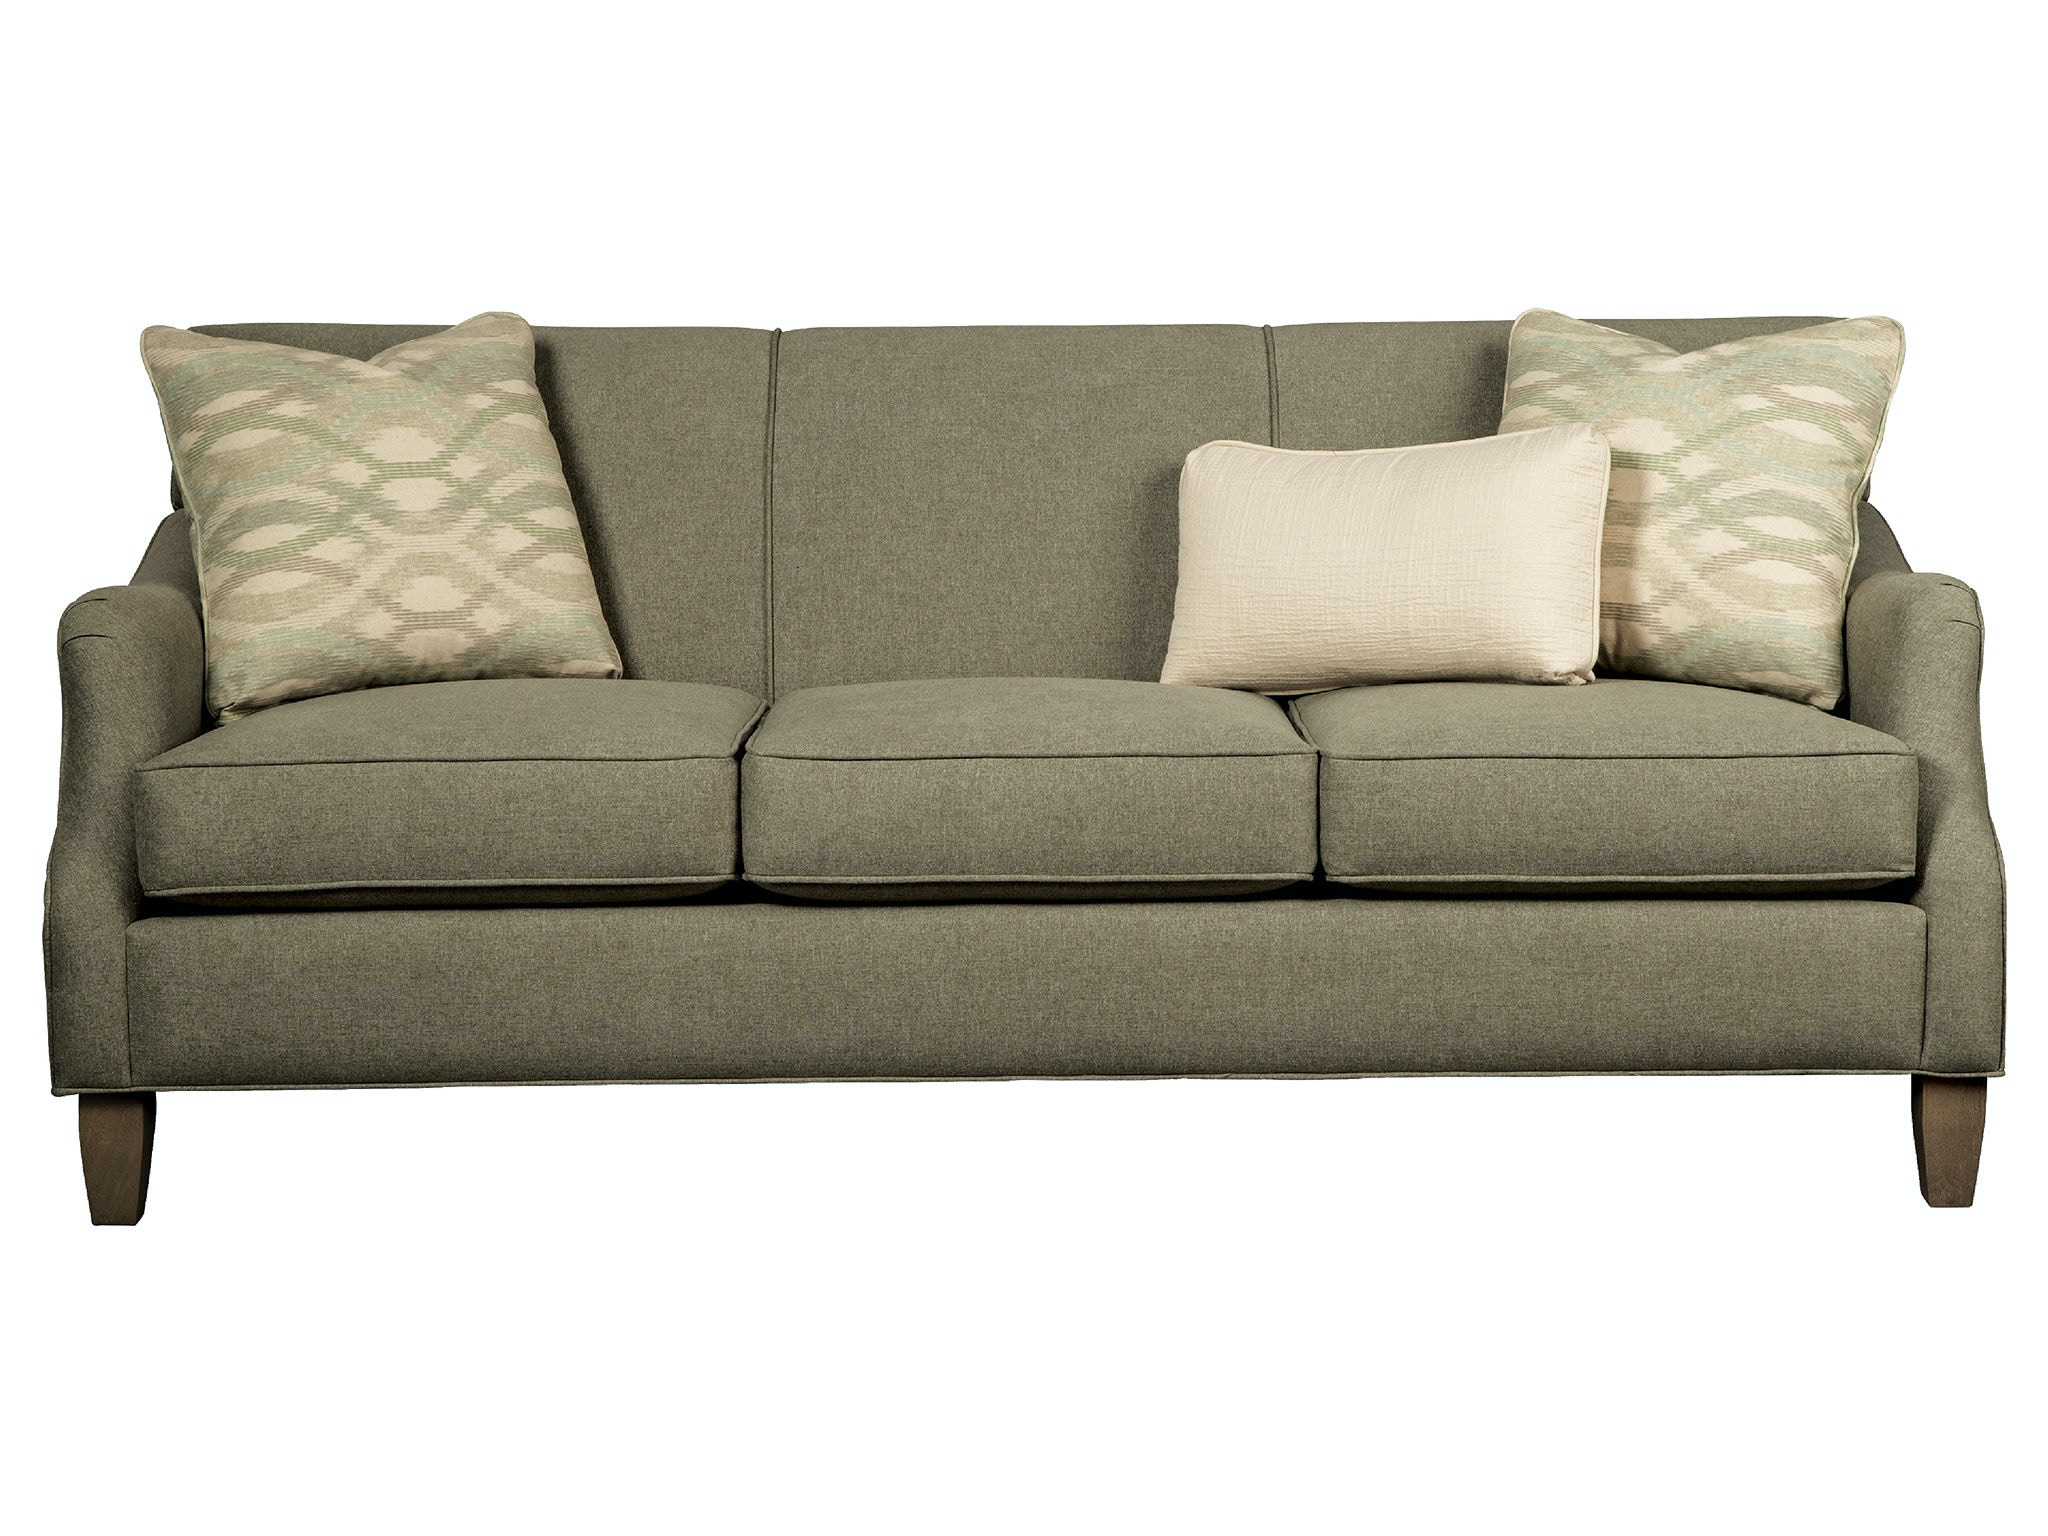 Cozy Life Sofa 774050 ...